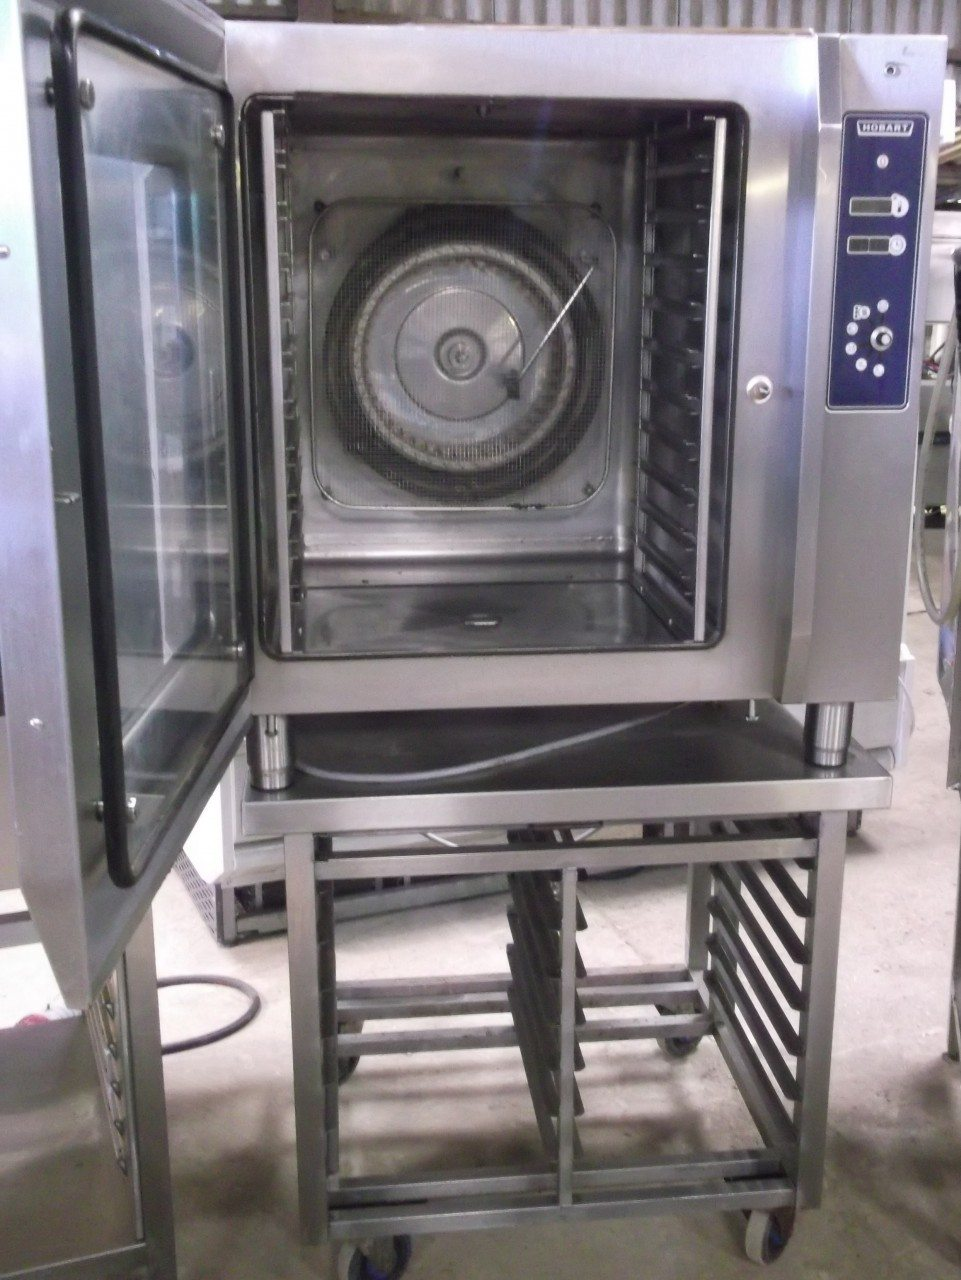 HOBART CSMH Electric 10 Grid Combi Oven